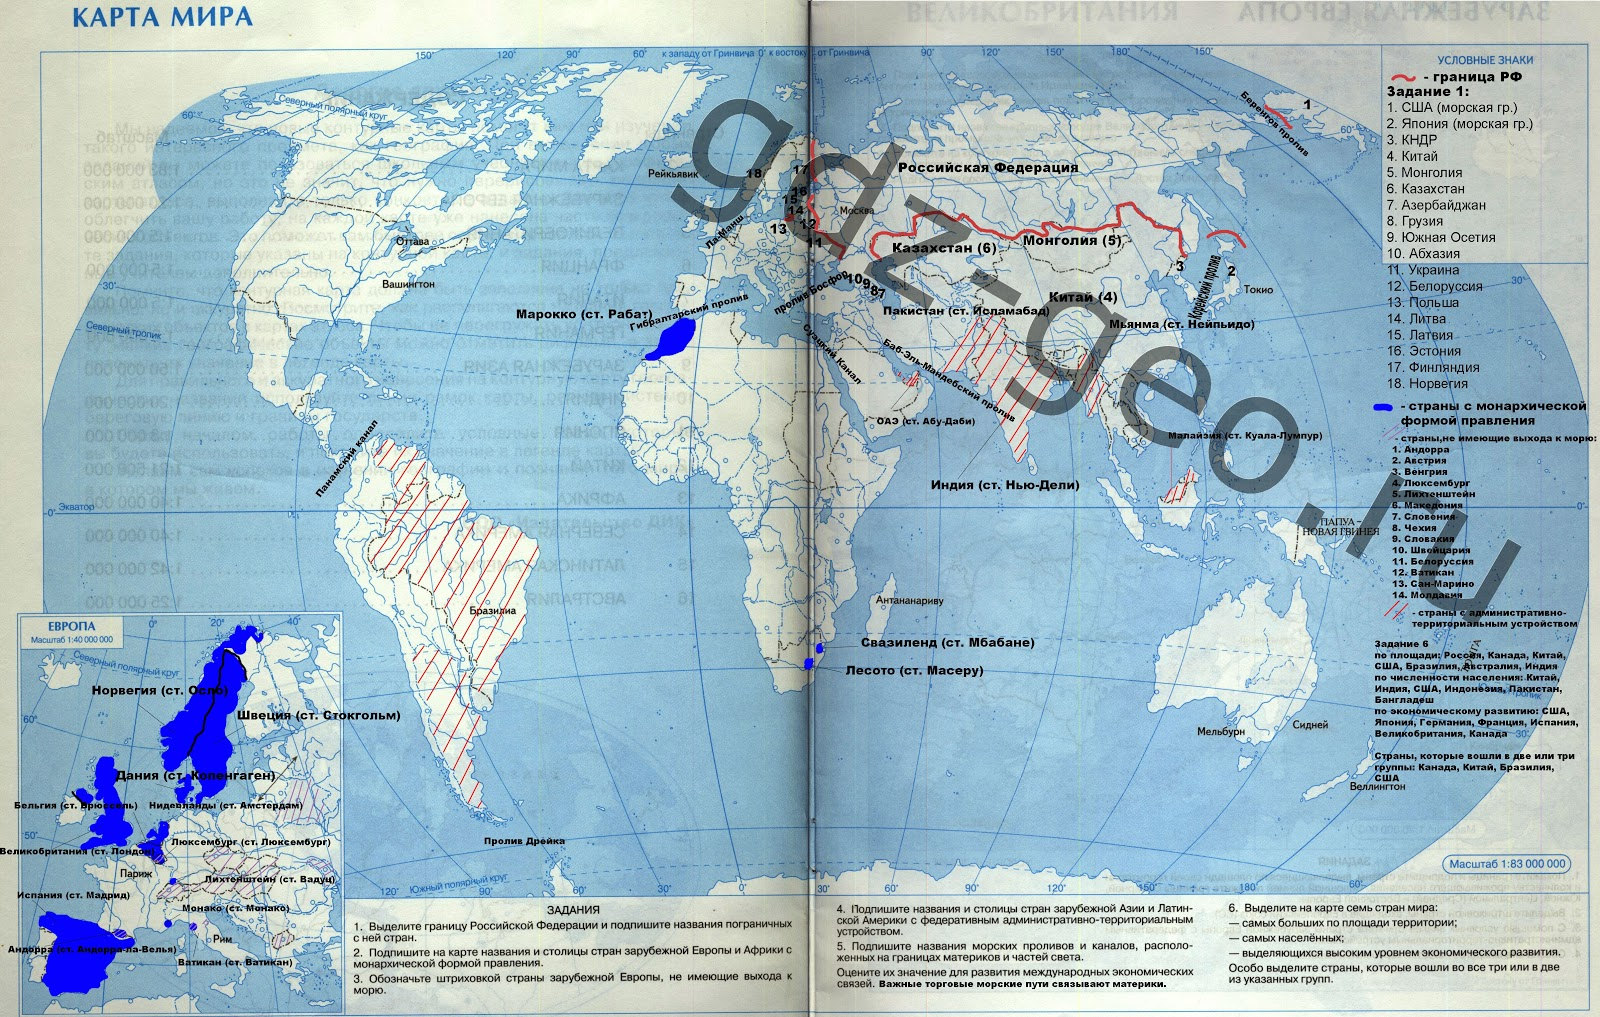 Гдз контурная карта за 10 класс